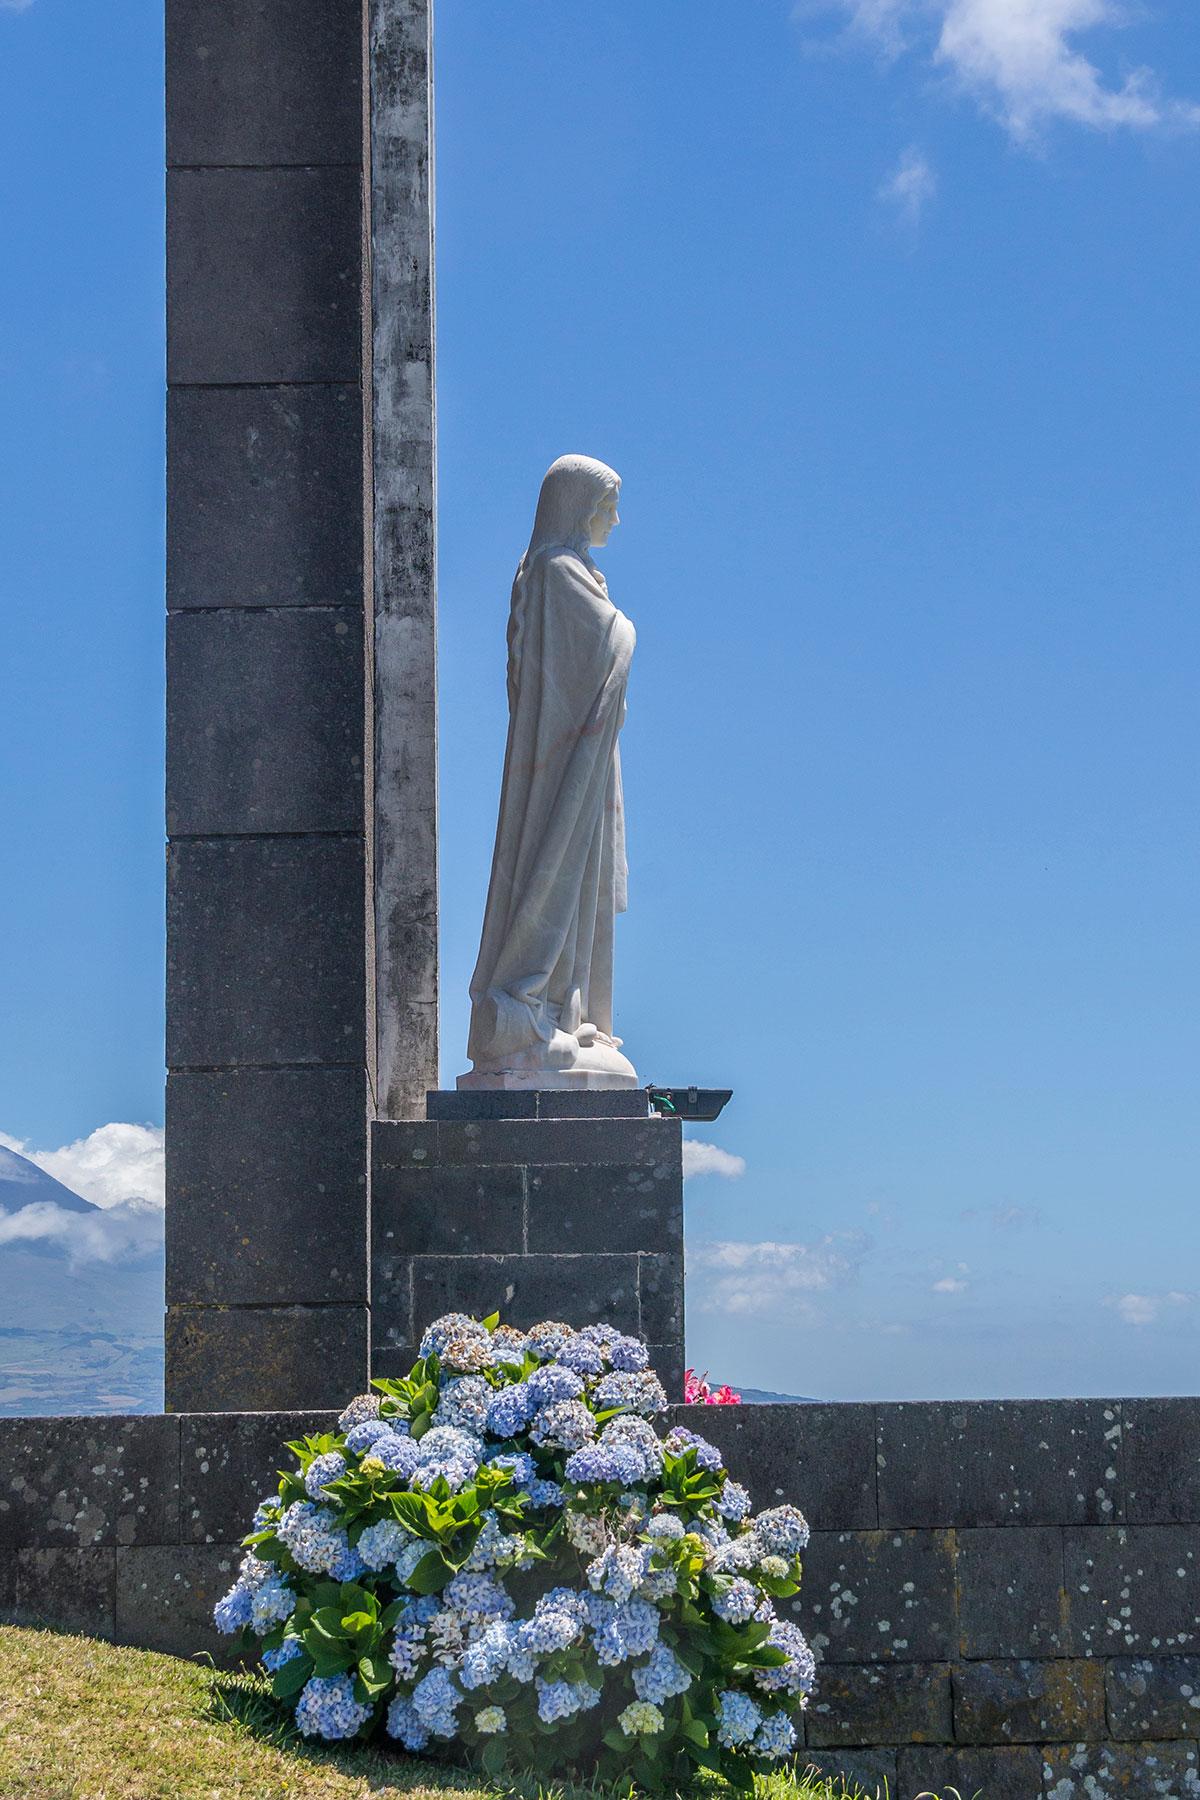 Azoren, Faial, Miradouro de Nossa Senhora da Conceicao